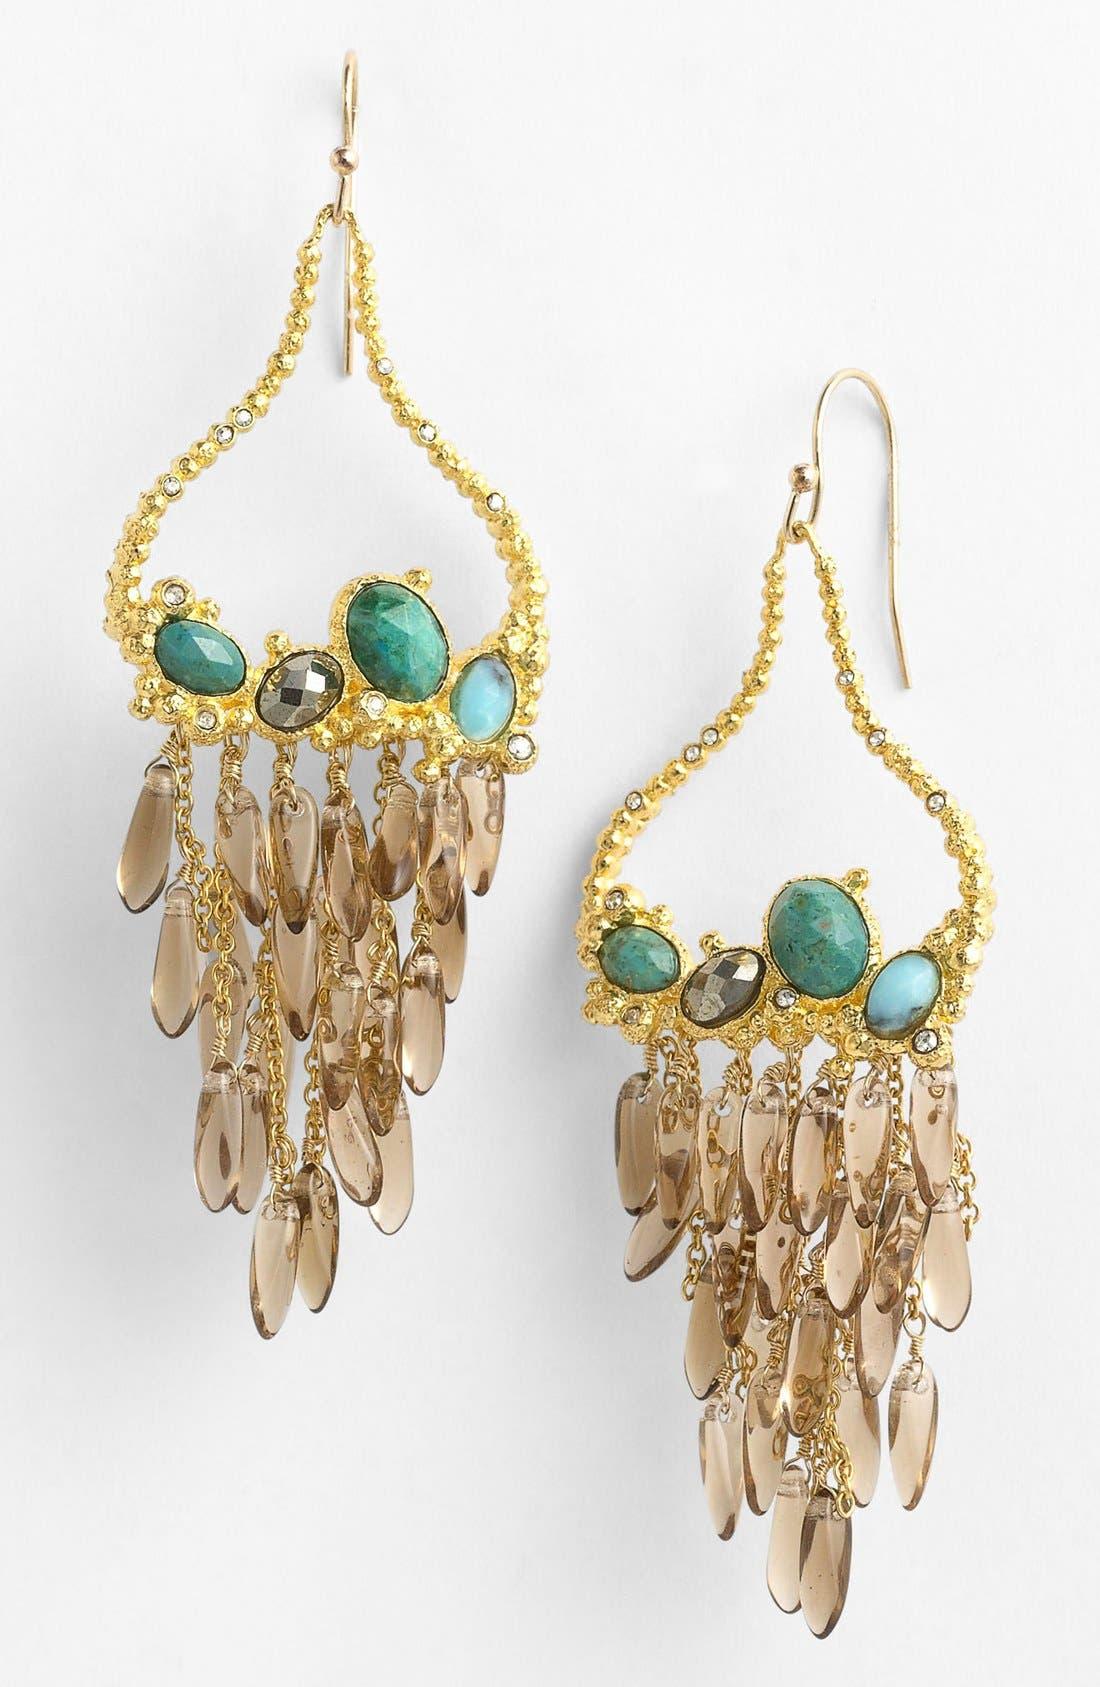 Alternate Image 1 Selected - Alexis Bittar 'Elements - Cordova' Chandelier Earrings